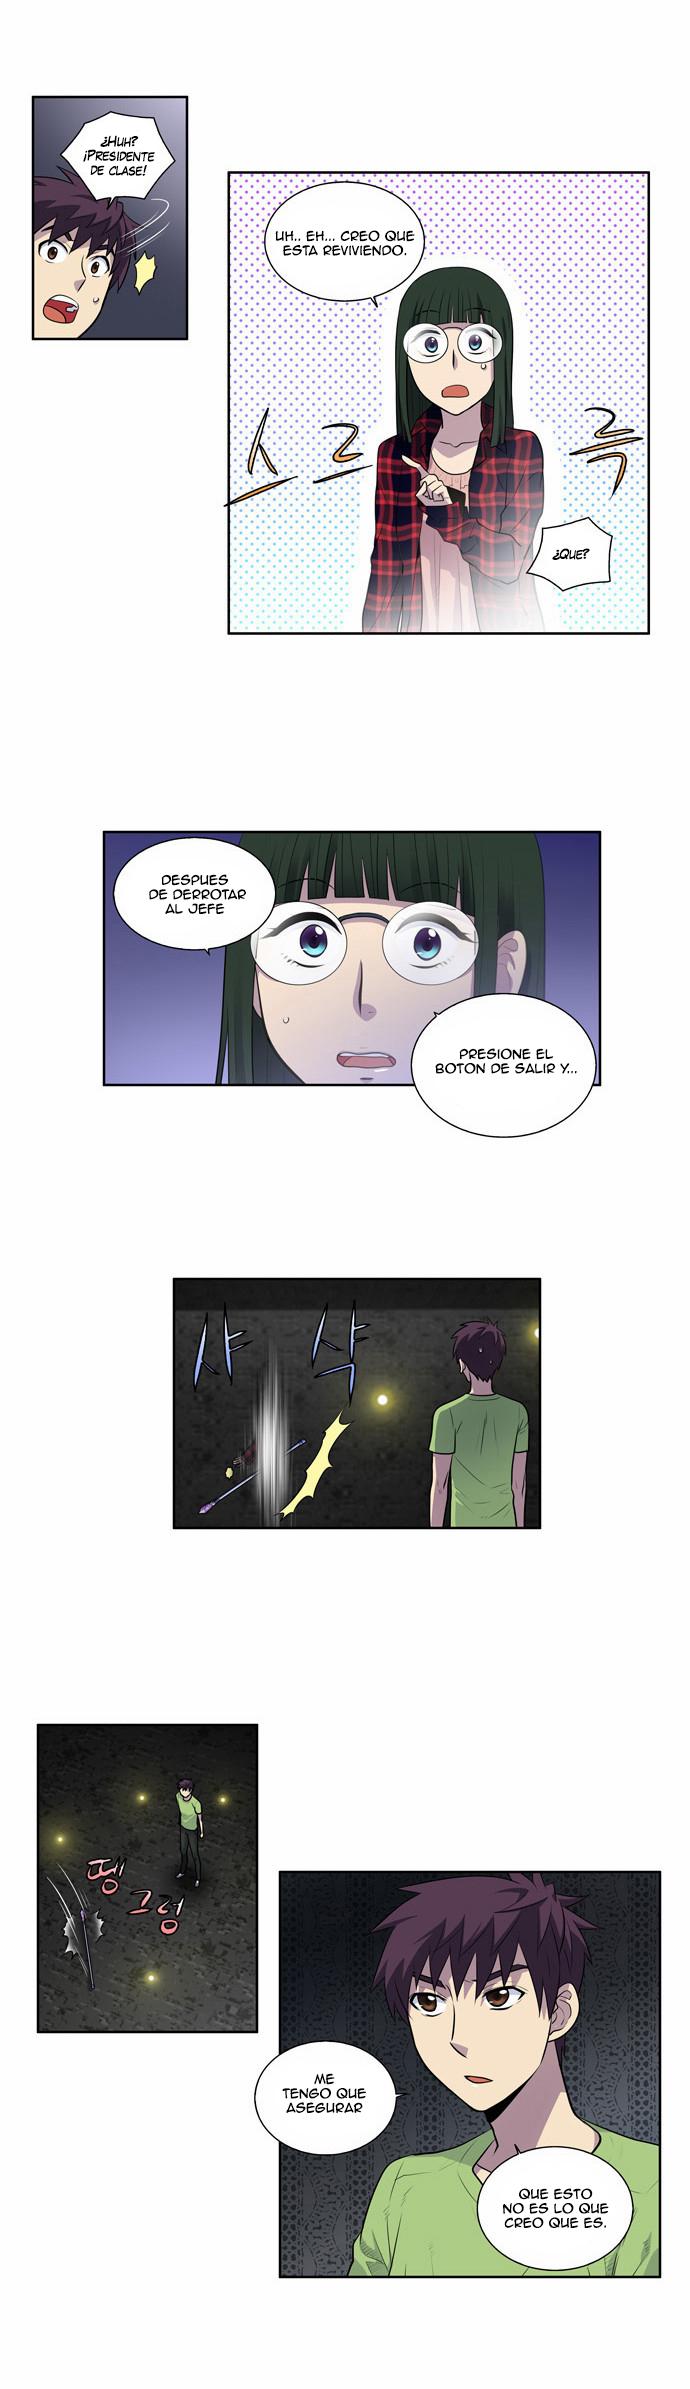 http://c5.ninemanga.com/es_manga/61/1725/423524/b23c5765e165d83aa924fa8f13c05f25.jpg Page 5